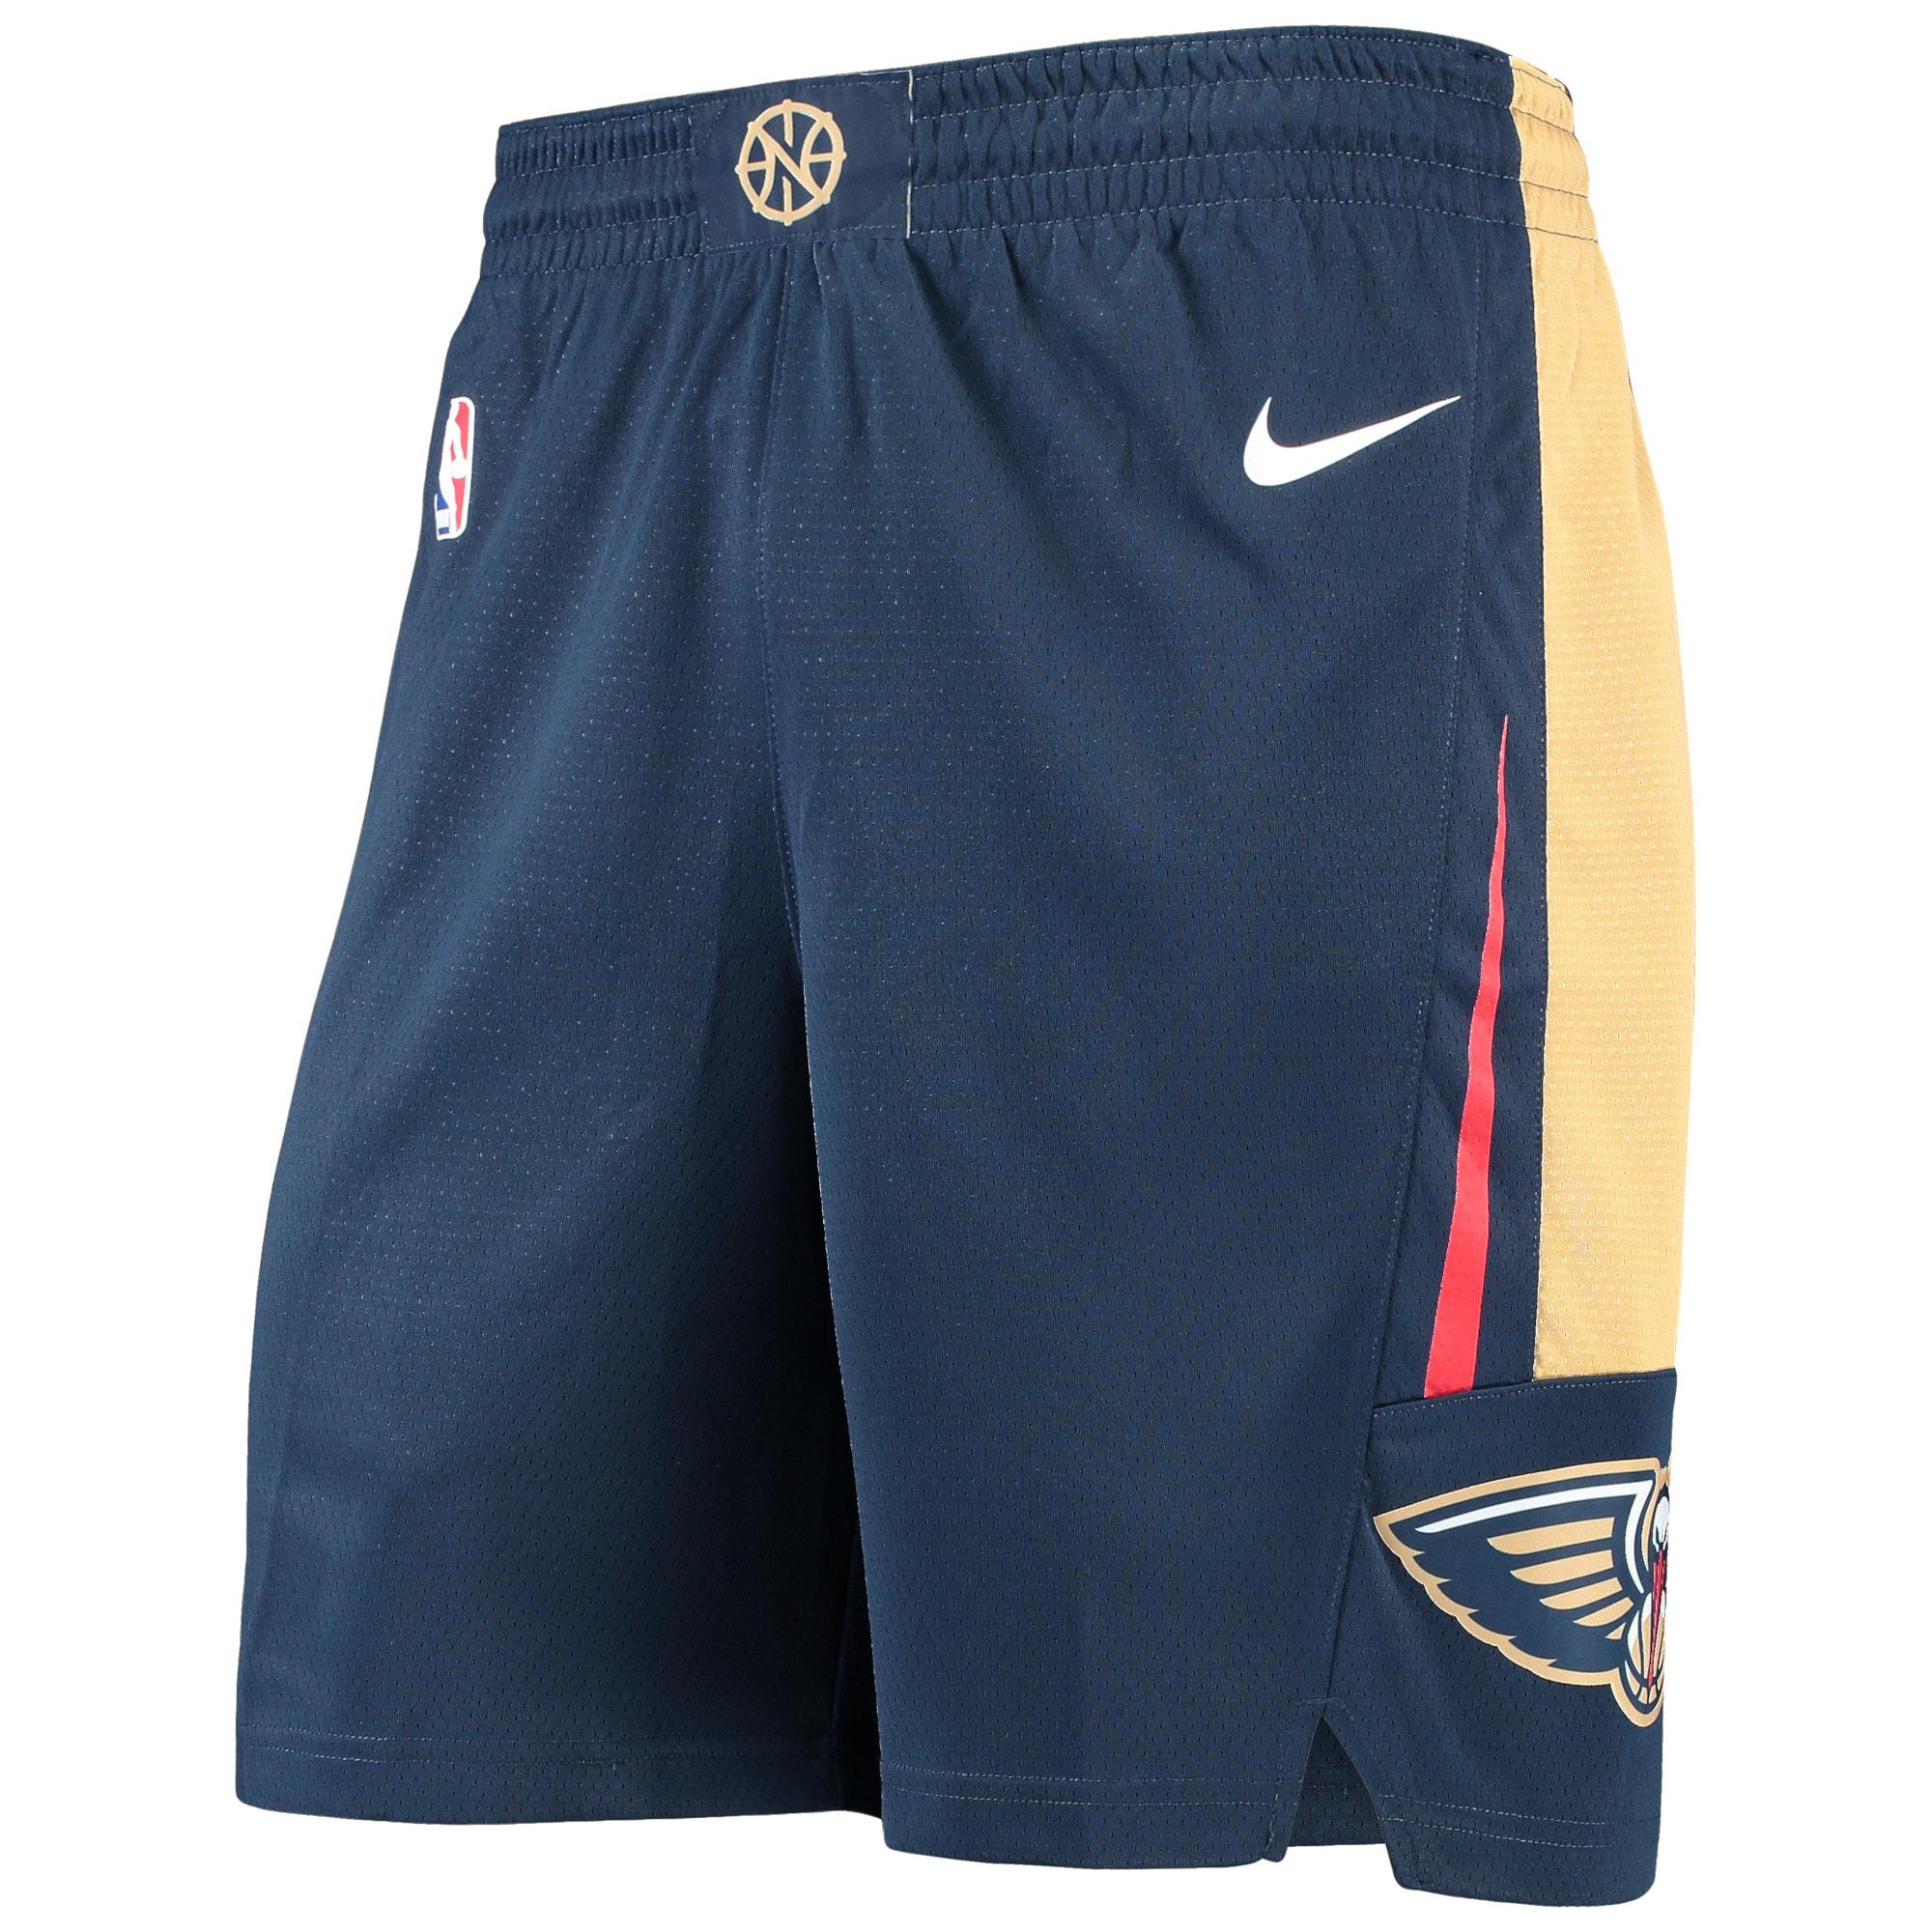 New Orleans Pelicans Nike Icon Swingman Basketball Performance Shorts - Navy